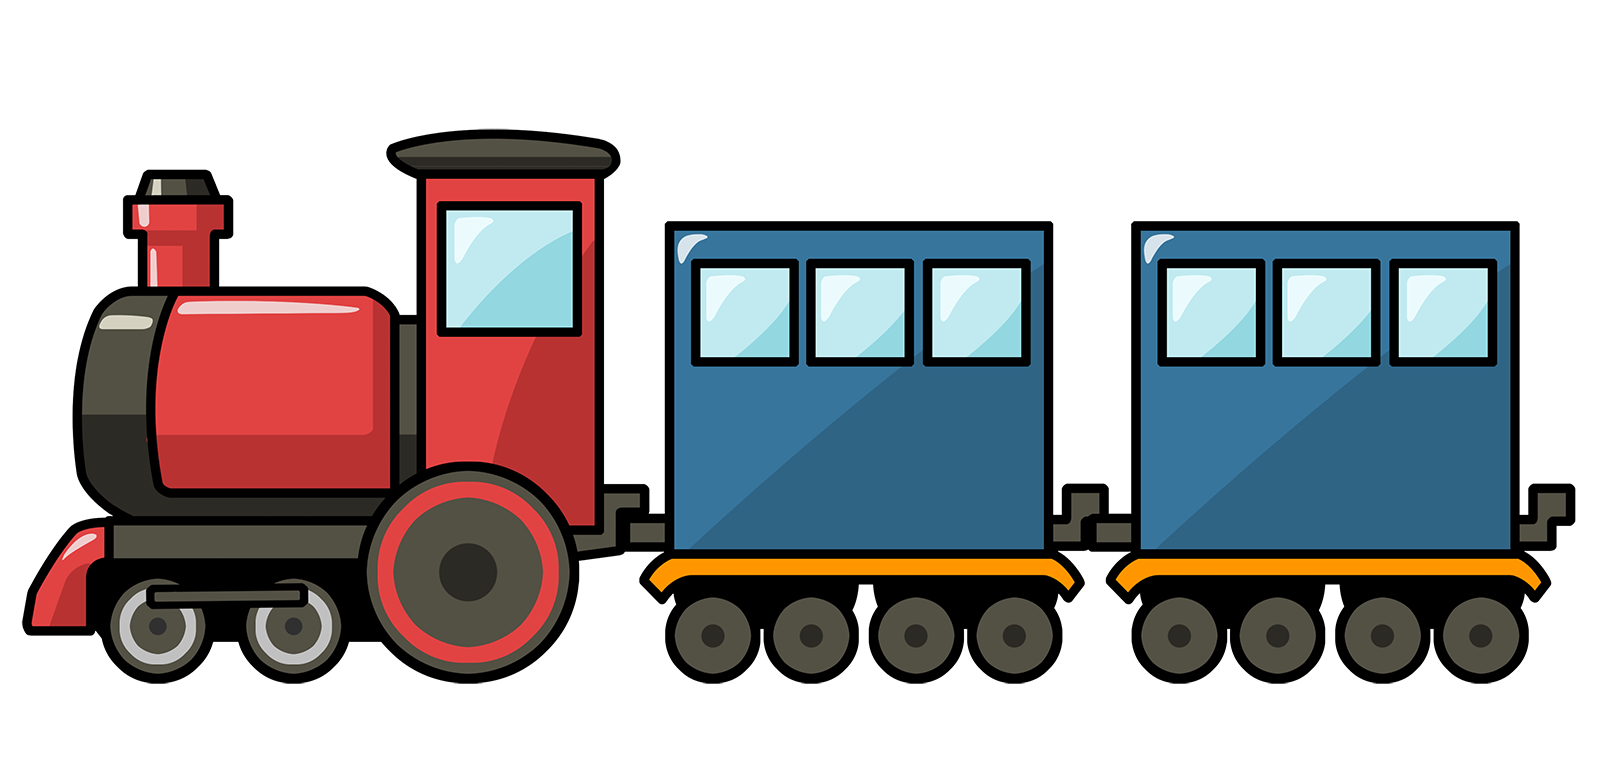 1600x783 Majestic Clip Art Train Free Clipart Pictures Clipartix Toy Trains